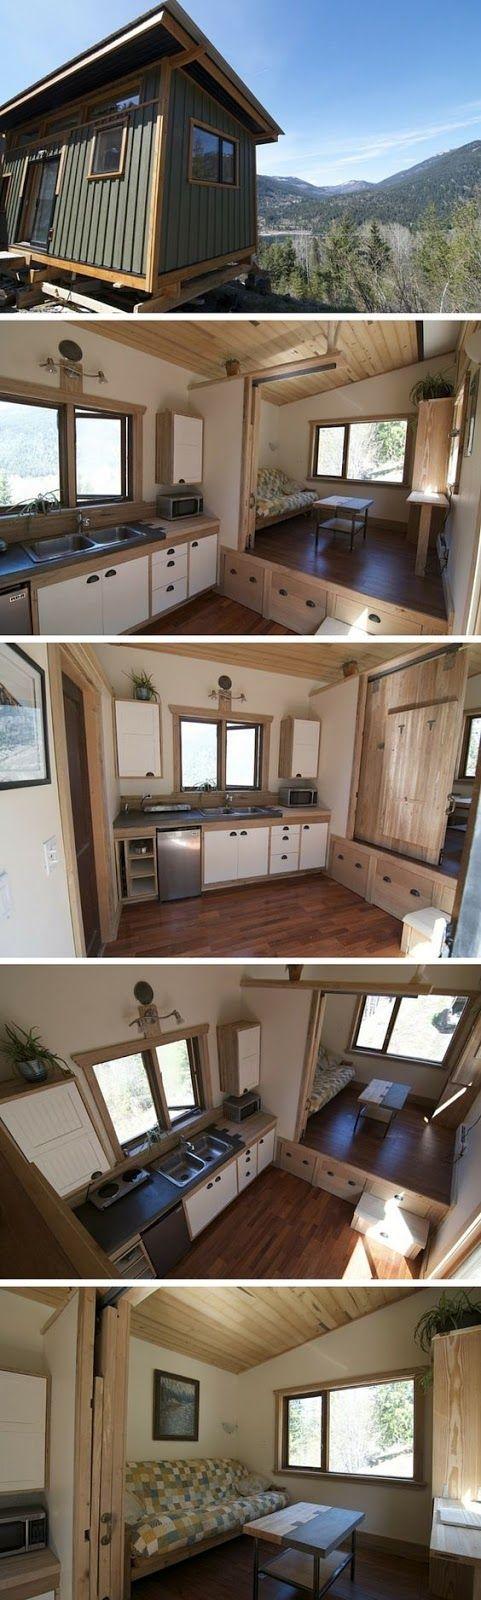 69 best Maison bois images on Pinterest Tiny house cabin, Home